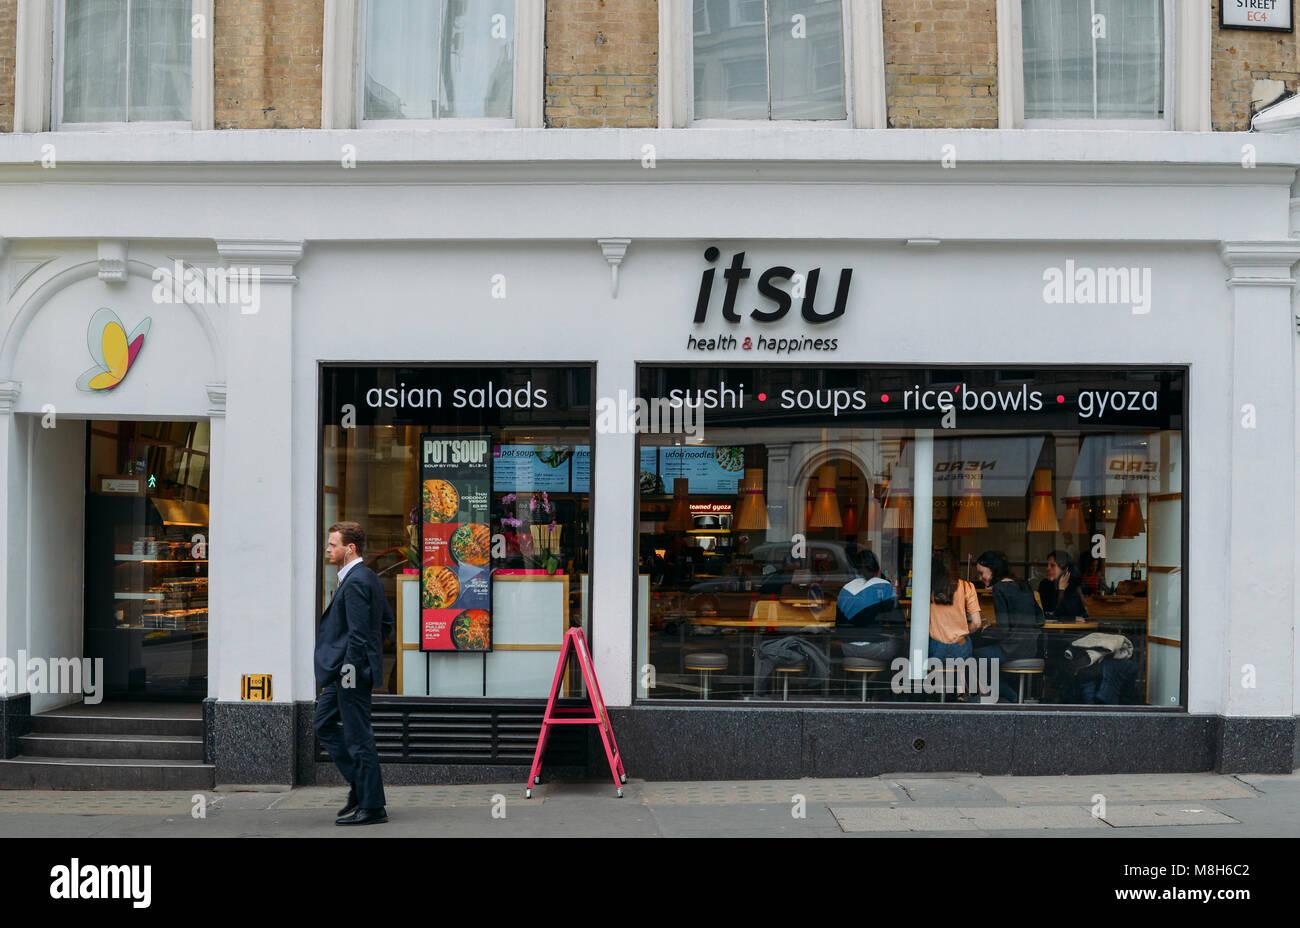 Fast Food Sushi Restaurant Chain